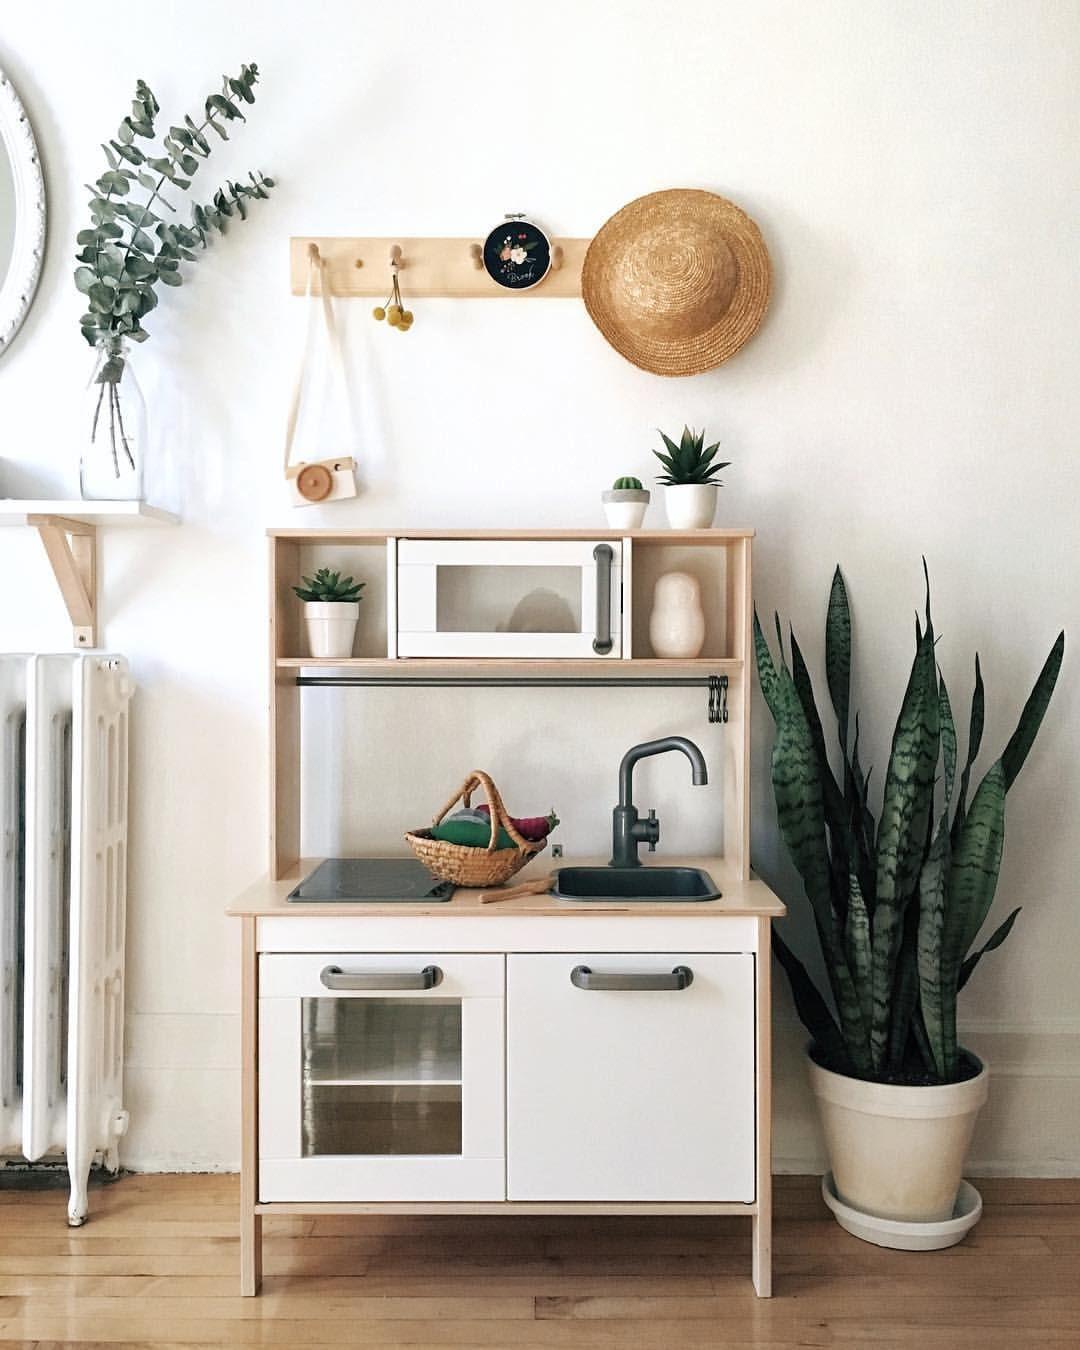 Ikea Kitchen Set Toy